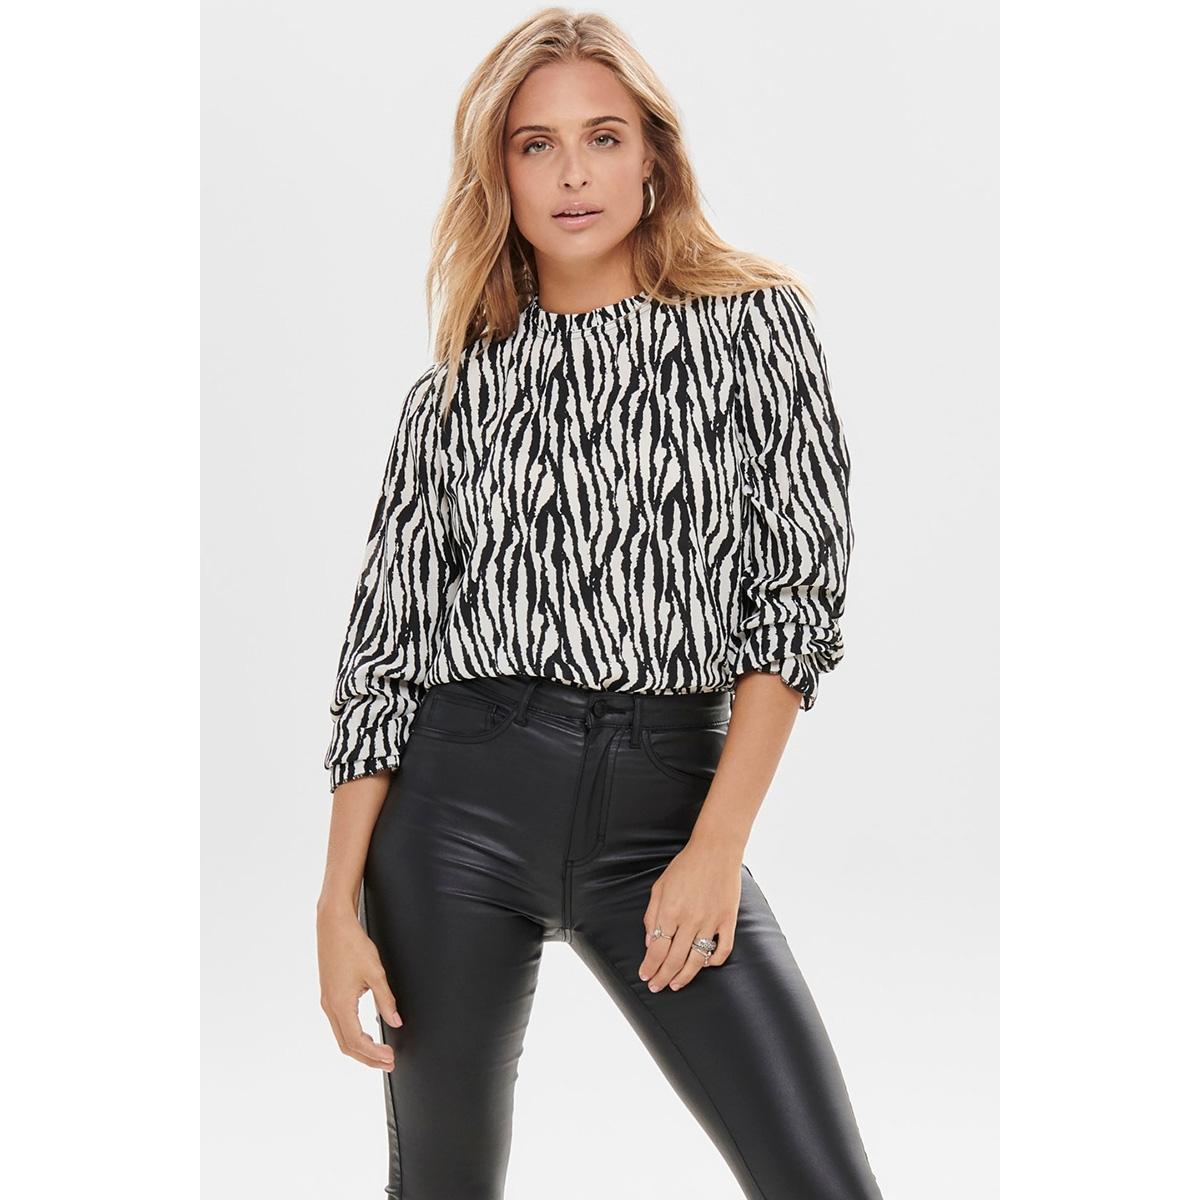 jdyjade l/s top wvn 15198847 jacqueline de yong blouse black/zebra